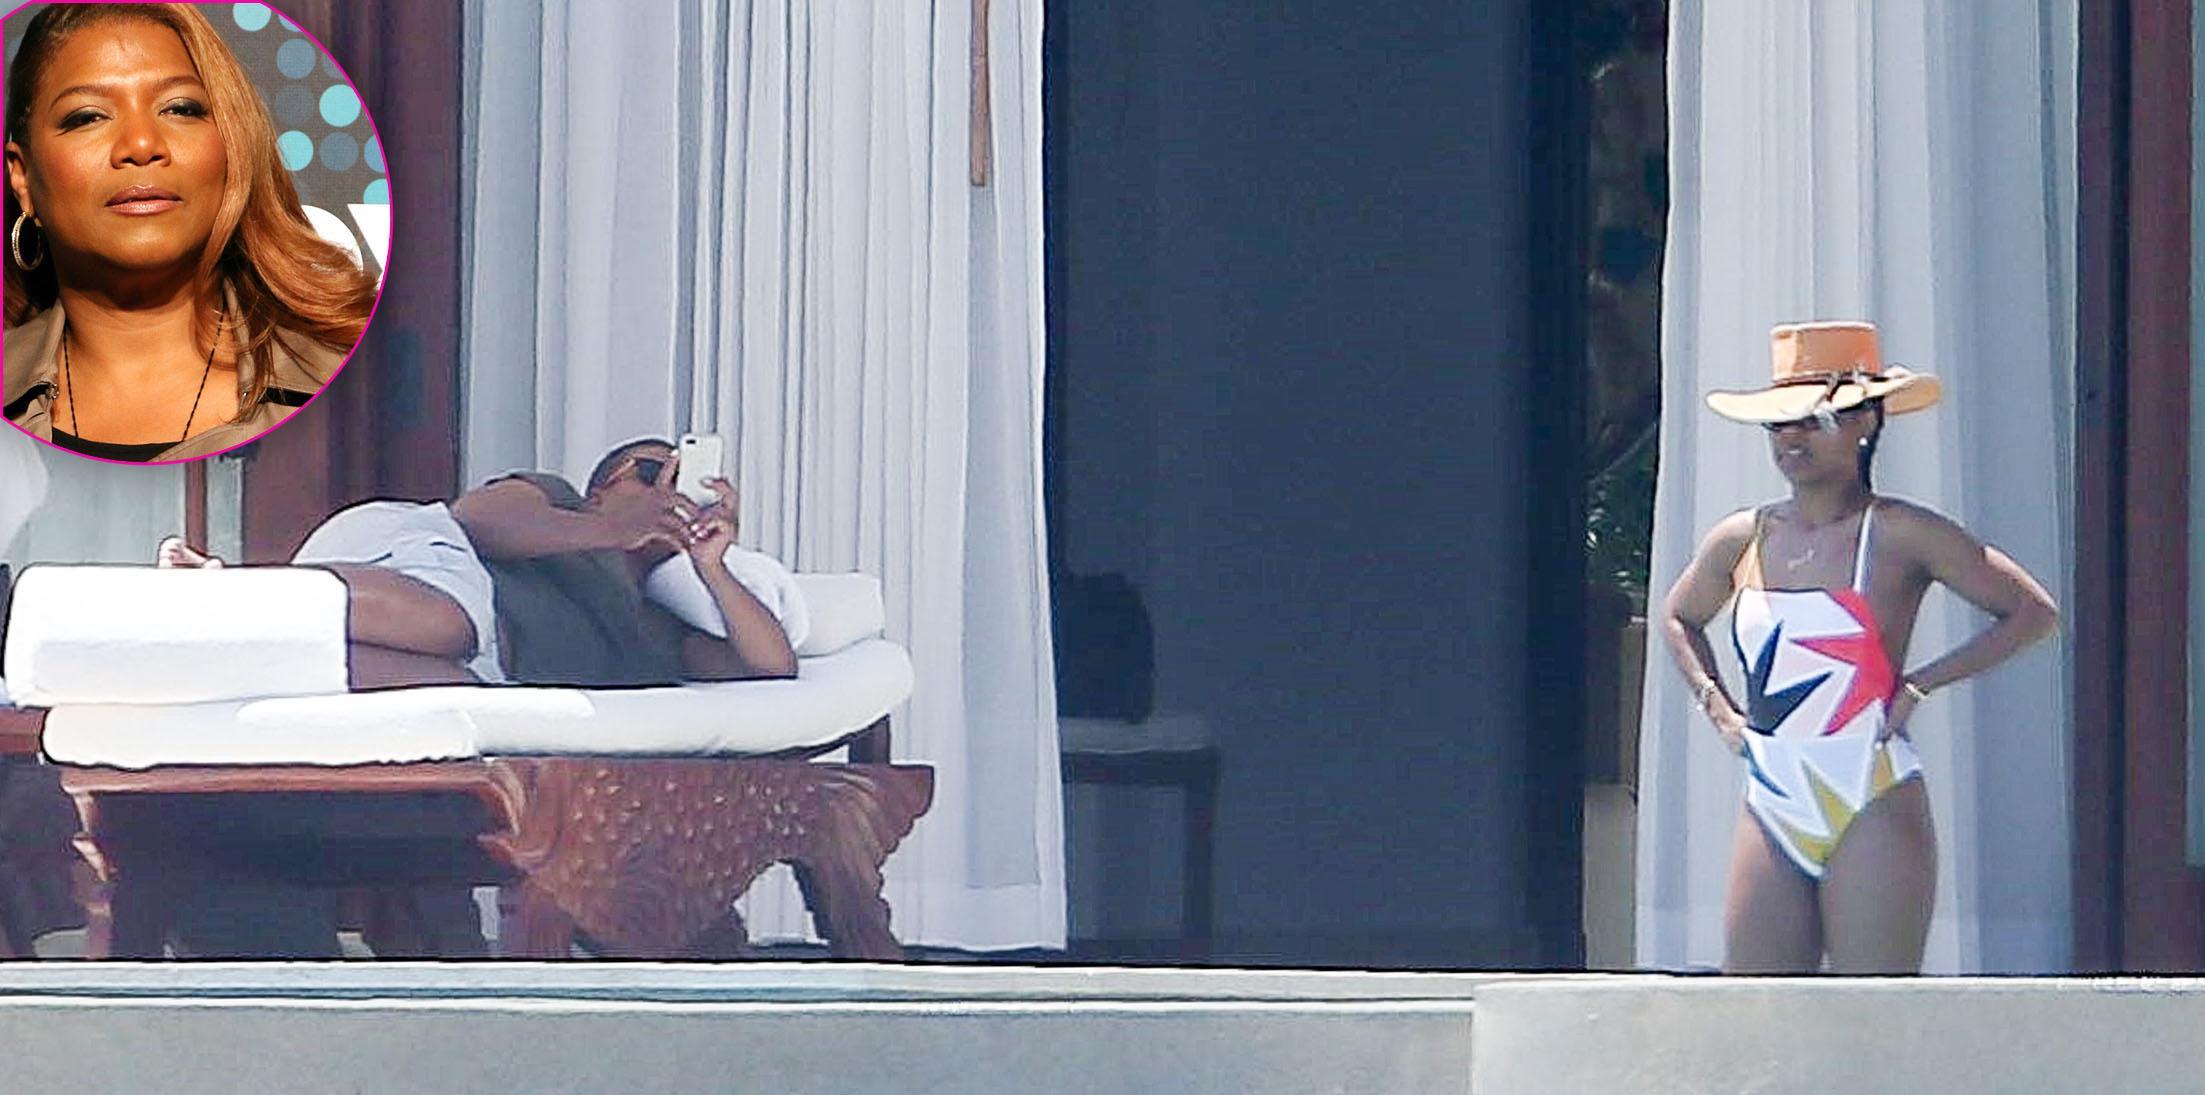 *EXCLUSIVE* Queen Latifah and Eboni Nichols soak up the Mexican sun!